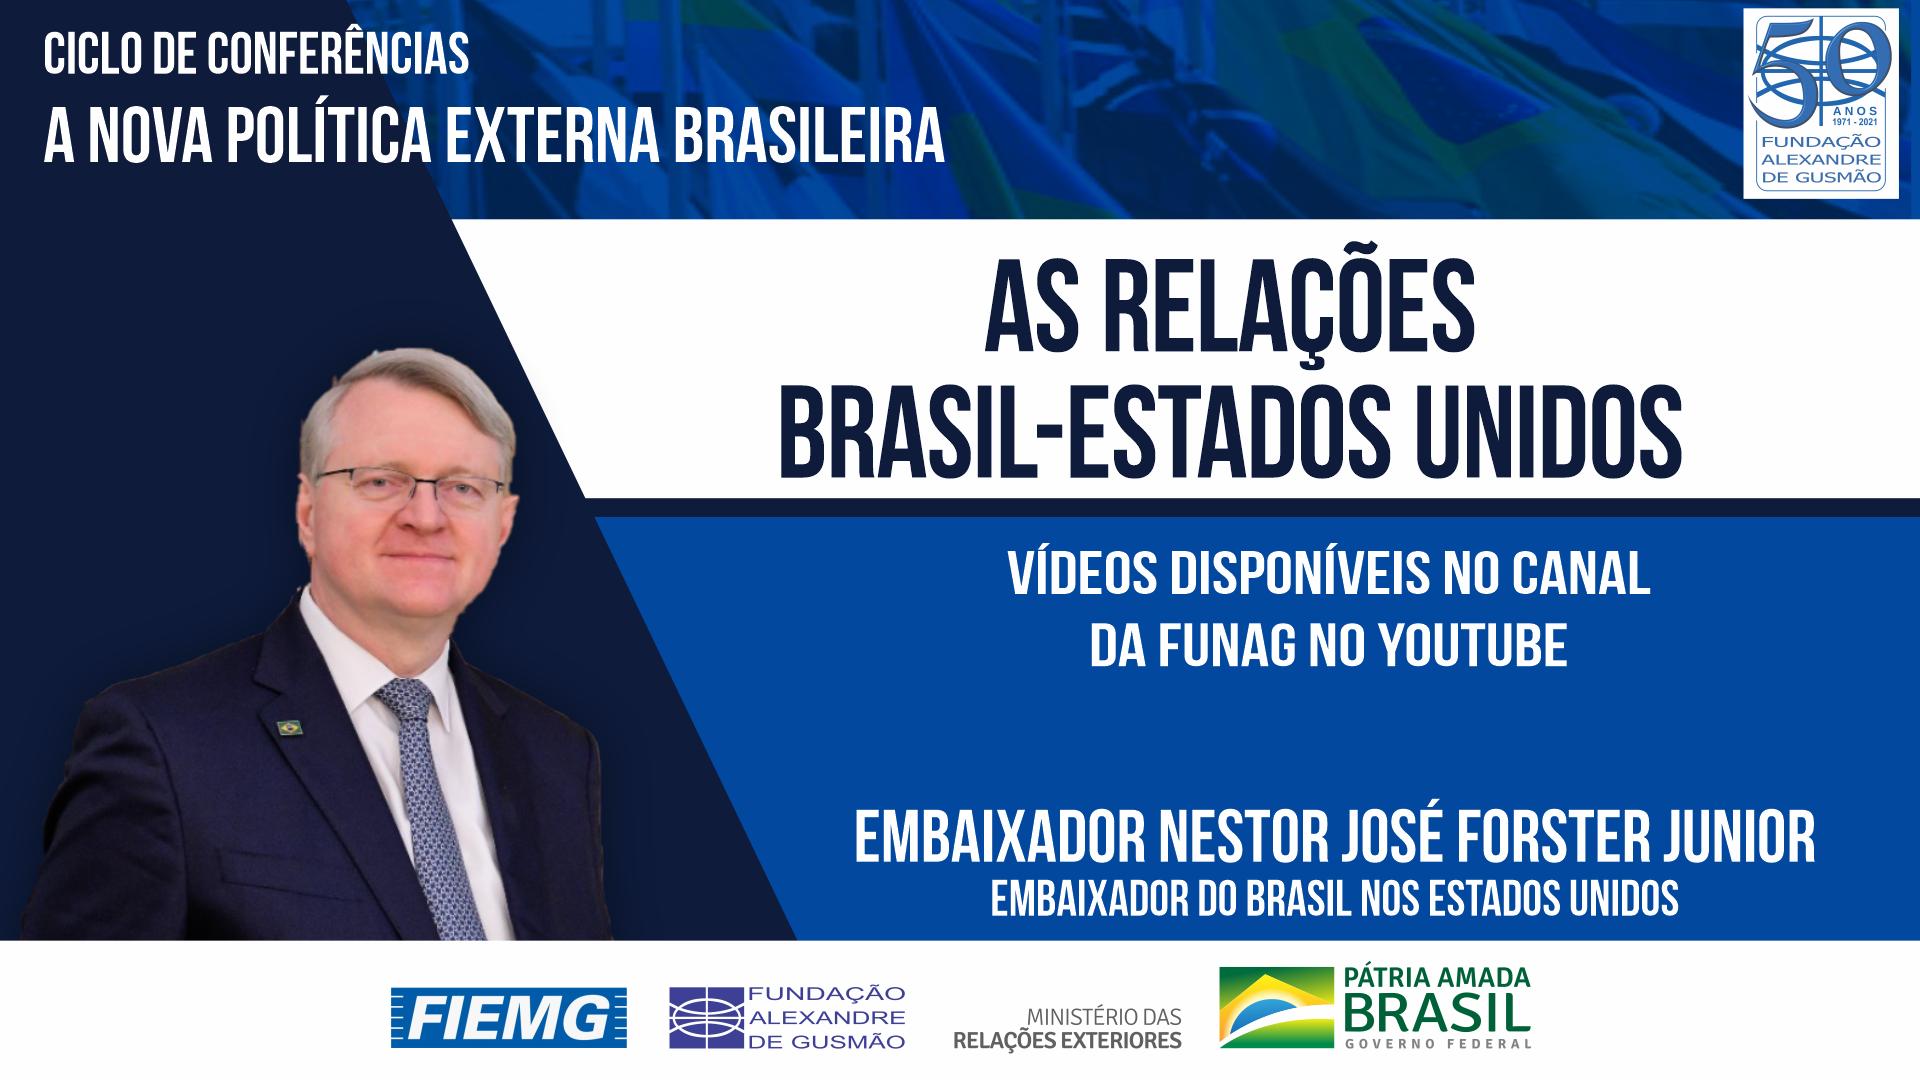 Assista aos vídeos da conferência do Embaixador do Brasil nos Estados Unidos, Nestor Forster